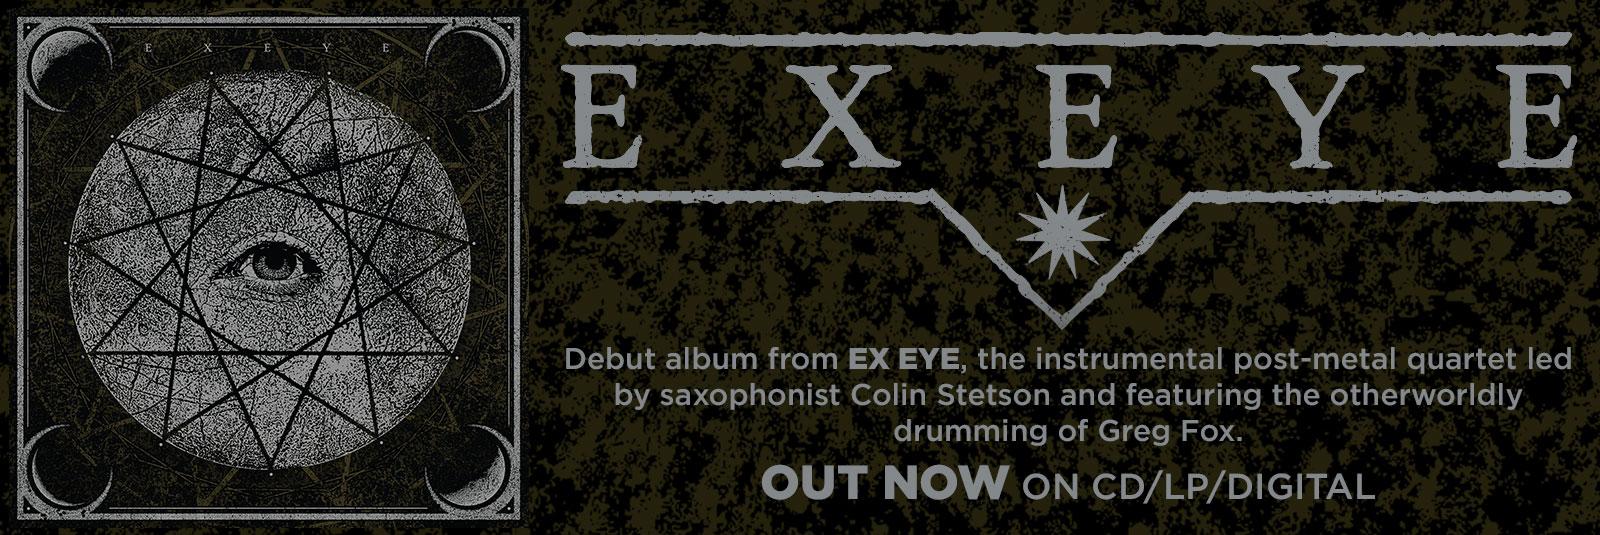 ex eye band, ex eye, relapse, experimental metal, secret chiefs 3